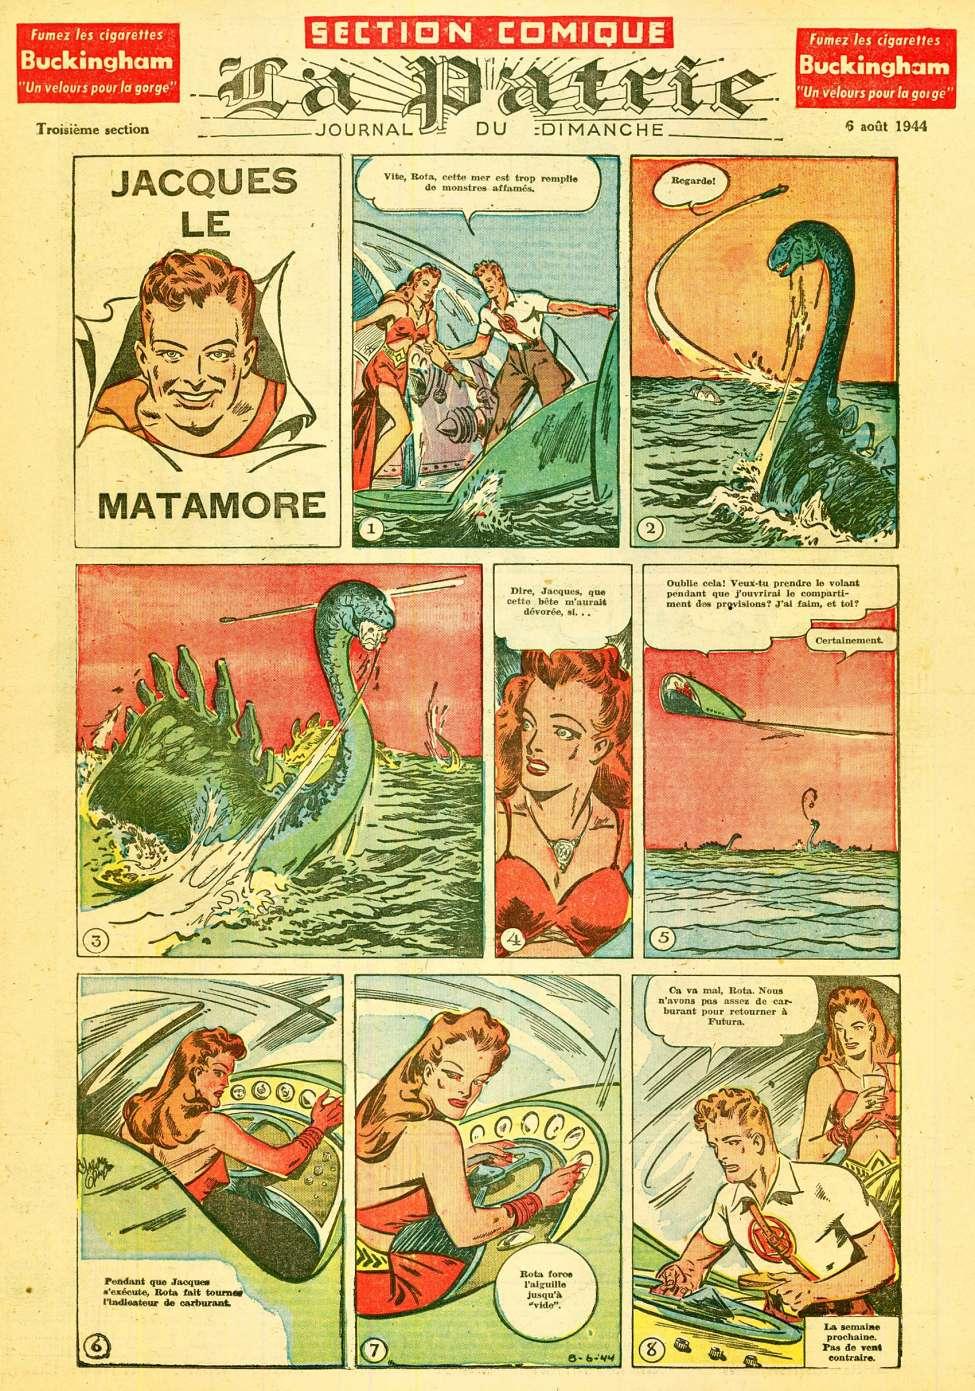 Comic Book Cover For La Patrie - Section Comique (1944-08-06)